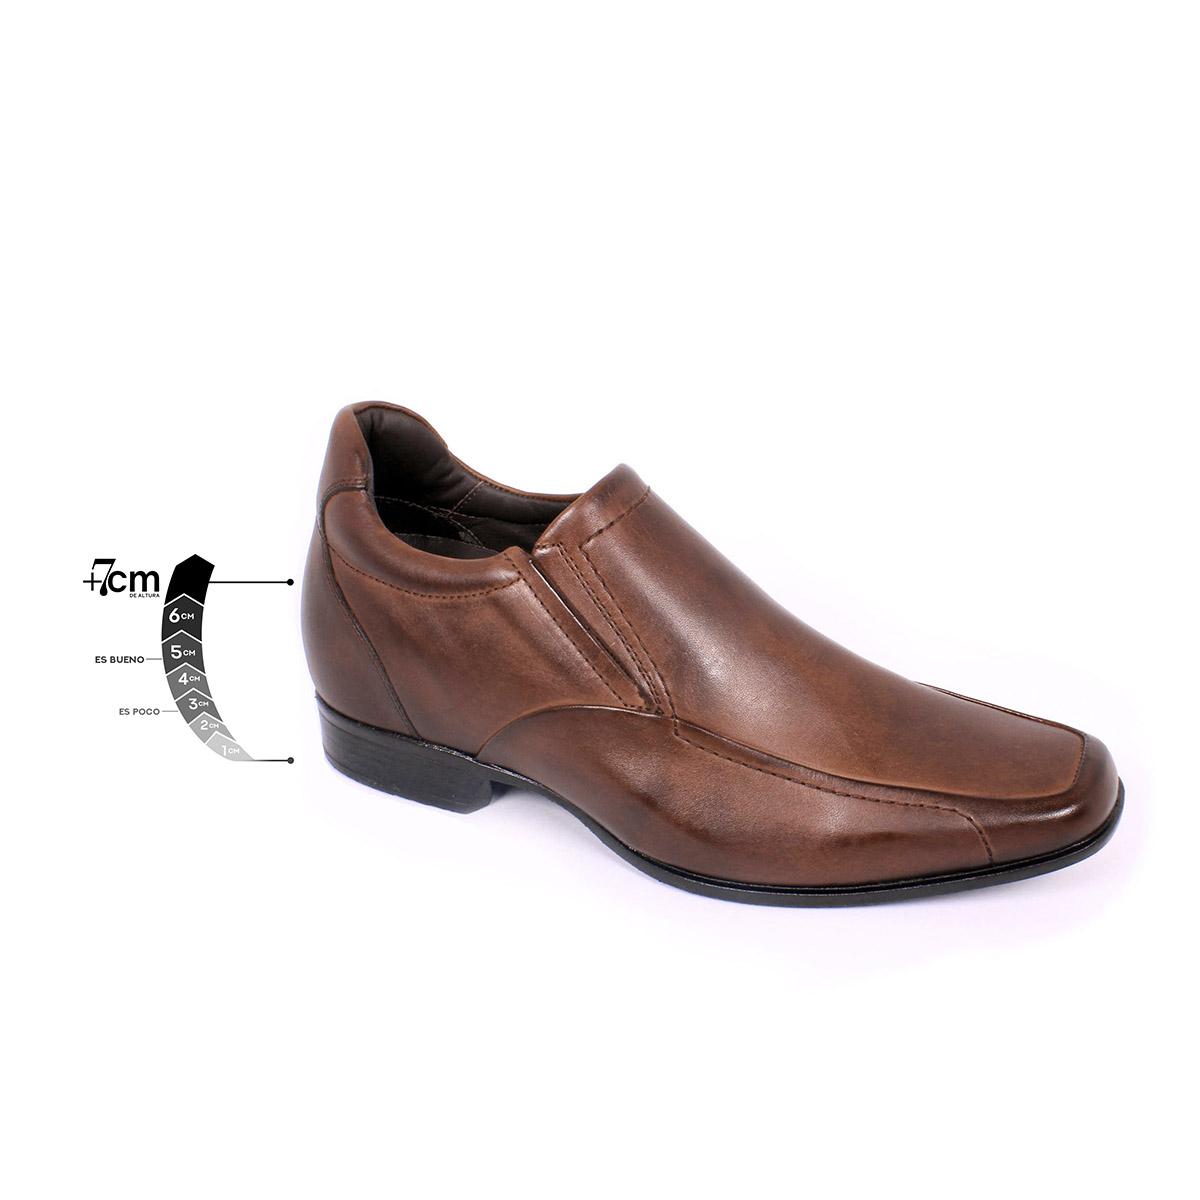 Zapato Formal Tabaco Café Max Denegri +7cms de Altura_75322